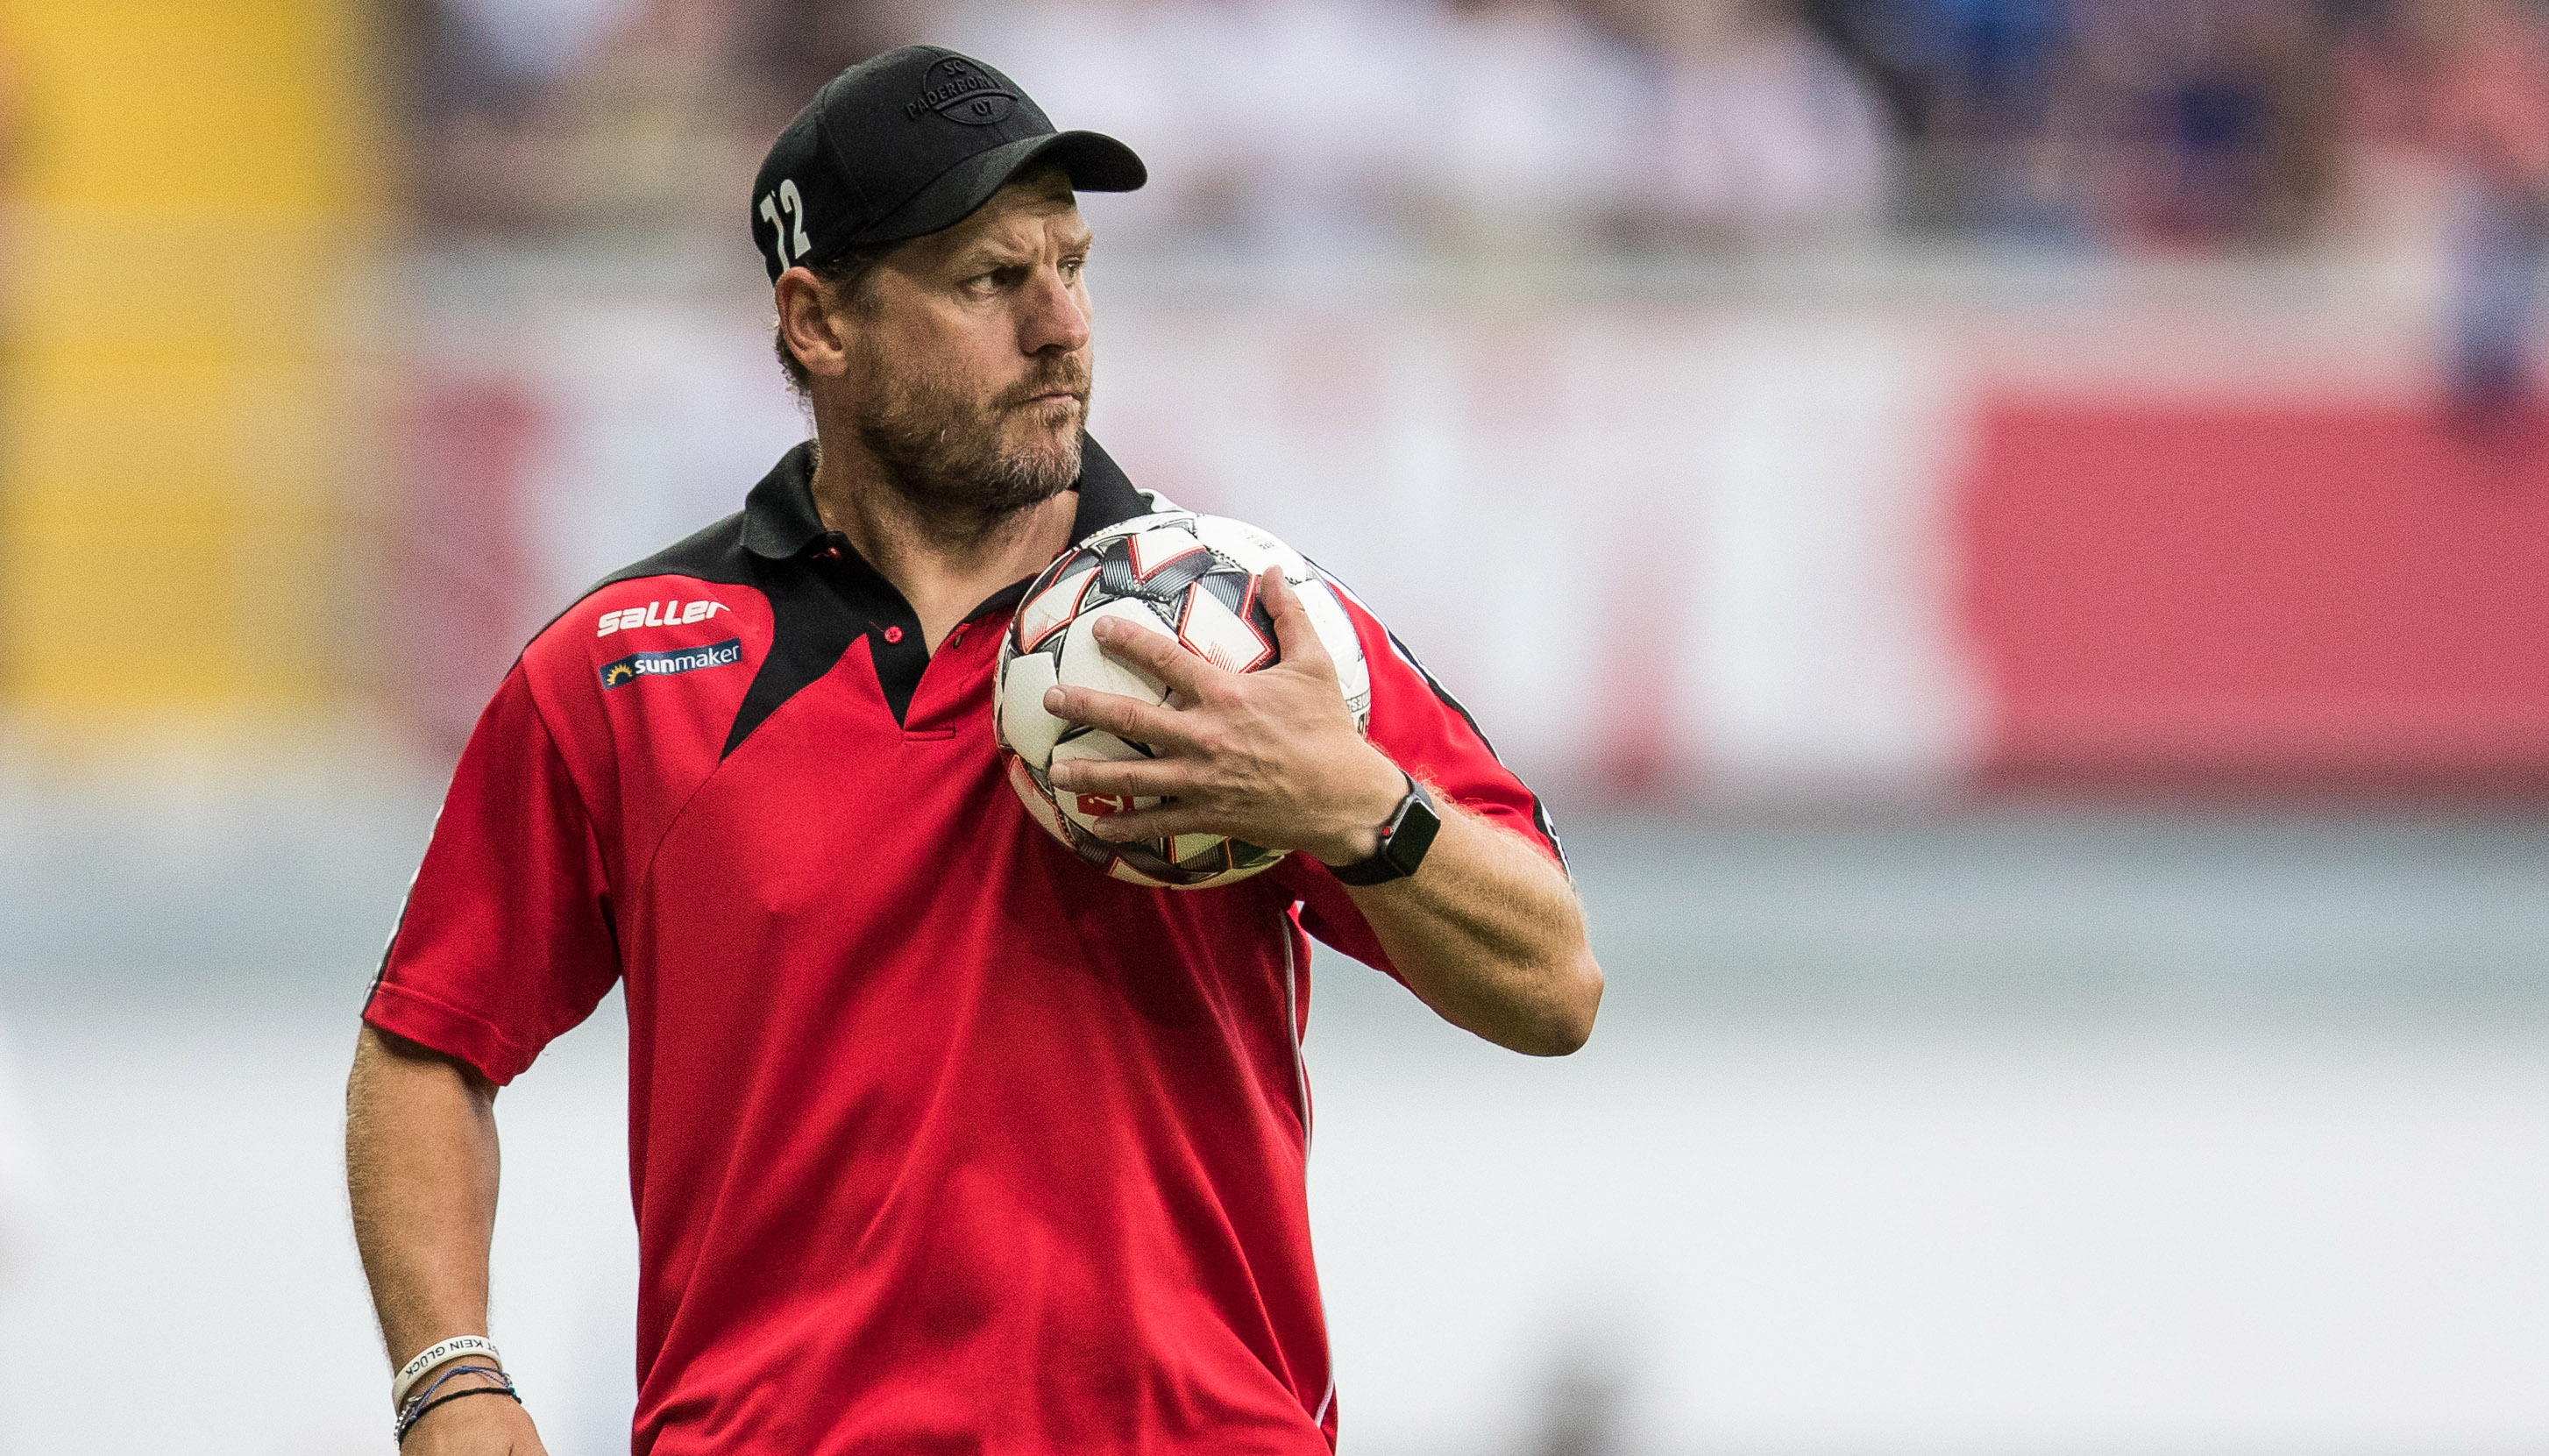 Dynamo Dresden – SC Paderborn: Offensiv zum letzten Aufstiegsschritt